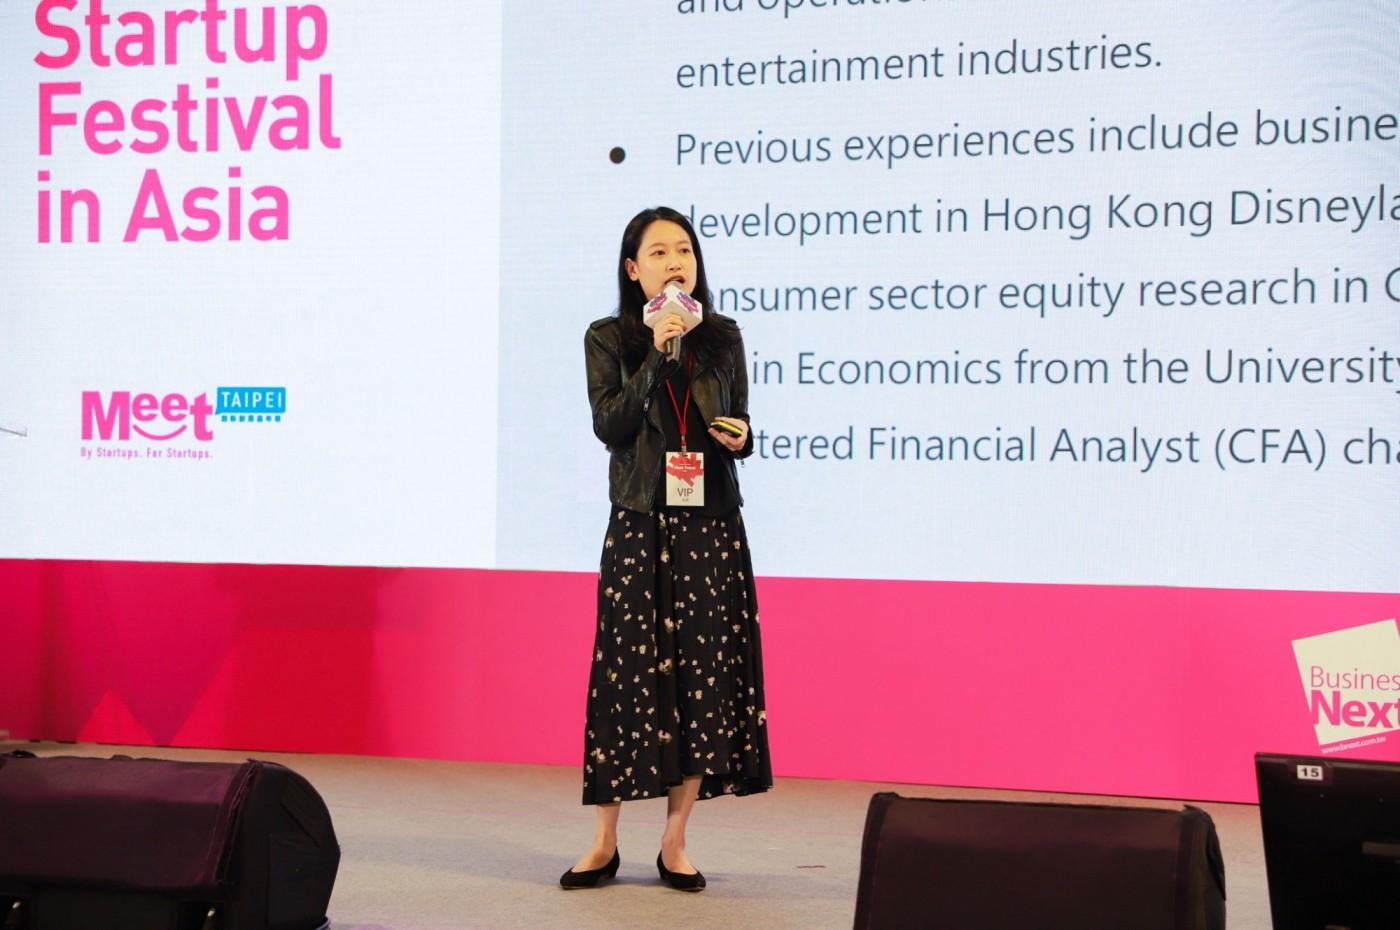 【2019 Meet Taipei】勇於炒掉錯的人!開店平台SHOPLINE解答跨國新創「人才、管理」2難題